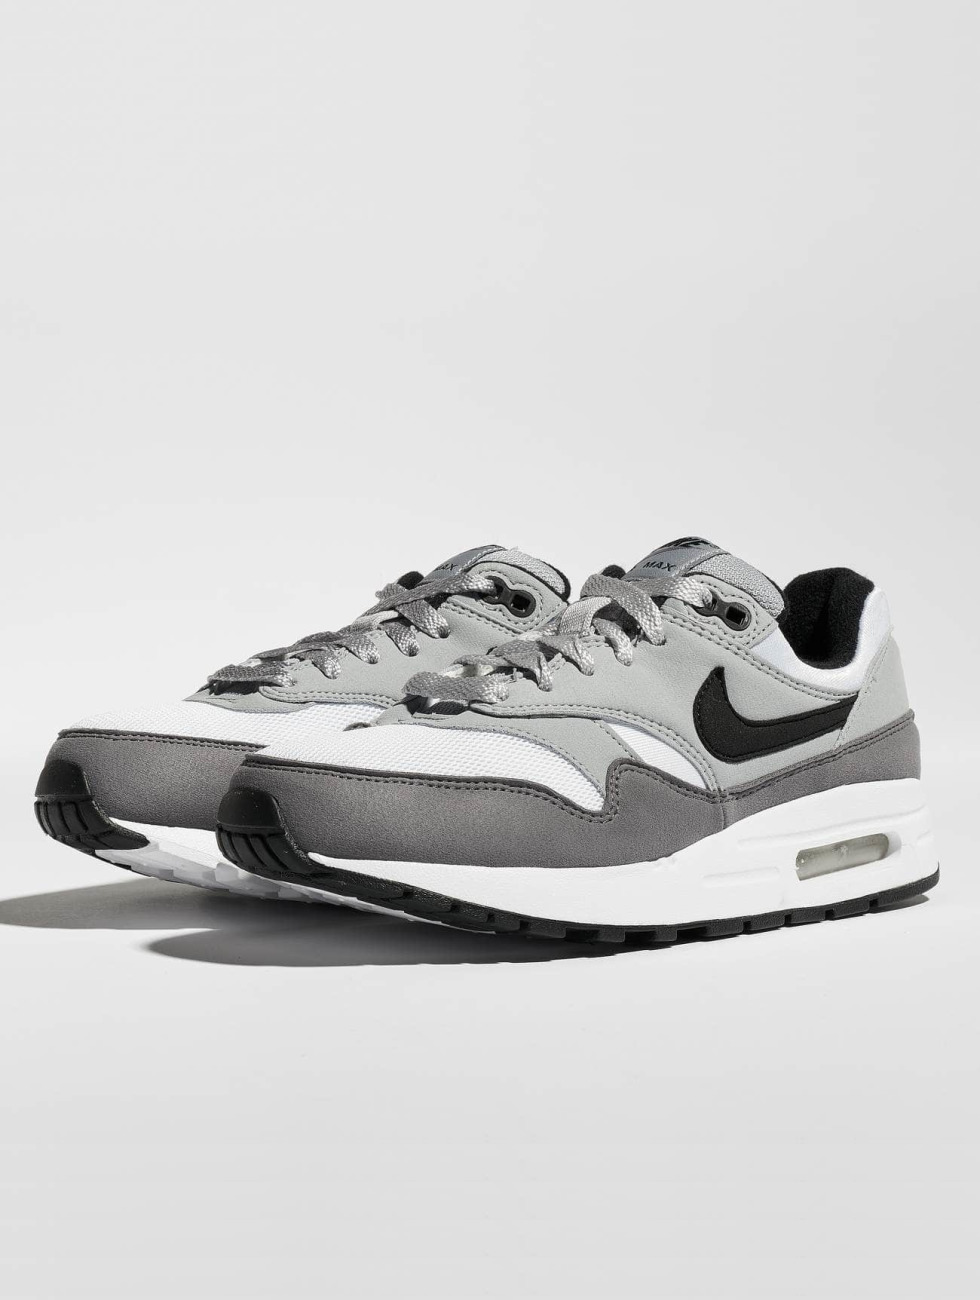 Nike Schoen / Sneaker Air Max 1 In Spirito 441765 daVcJtRWt